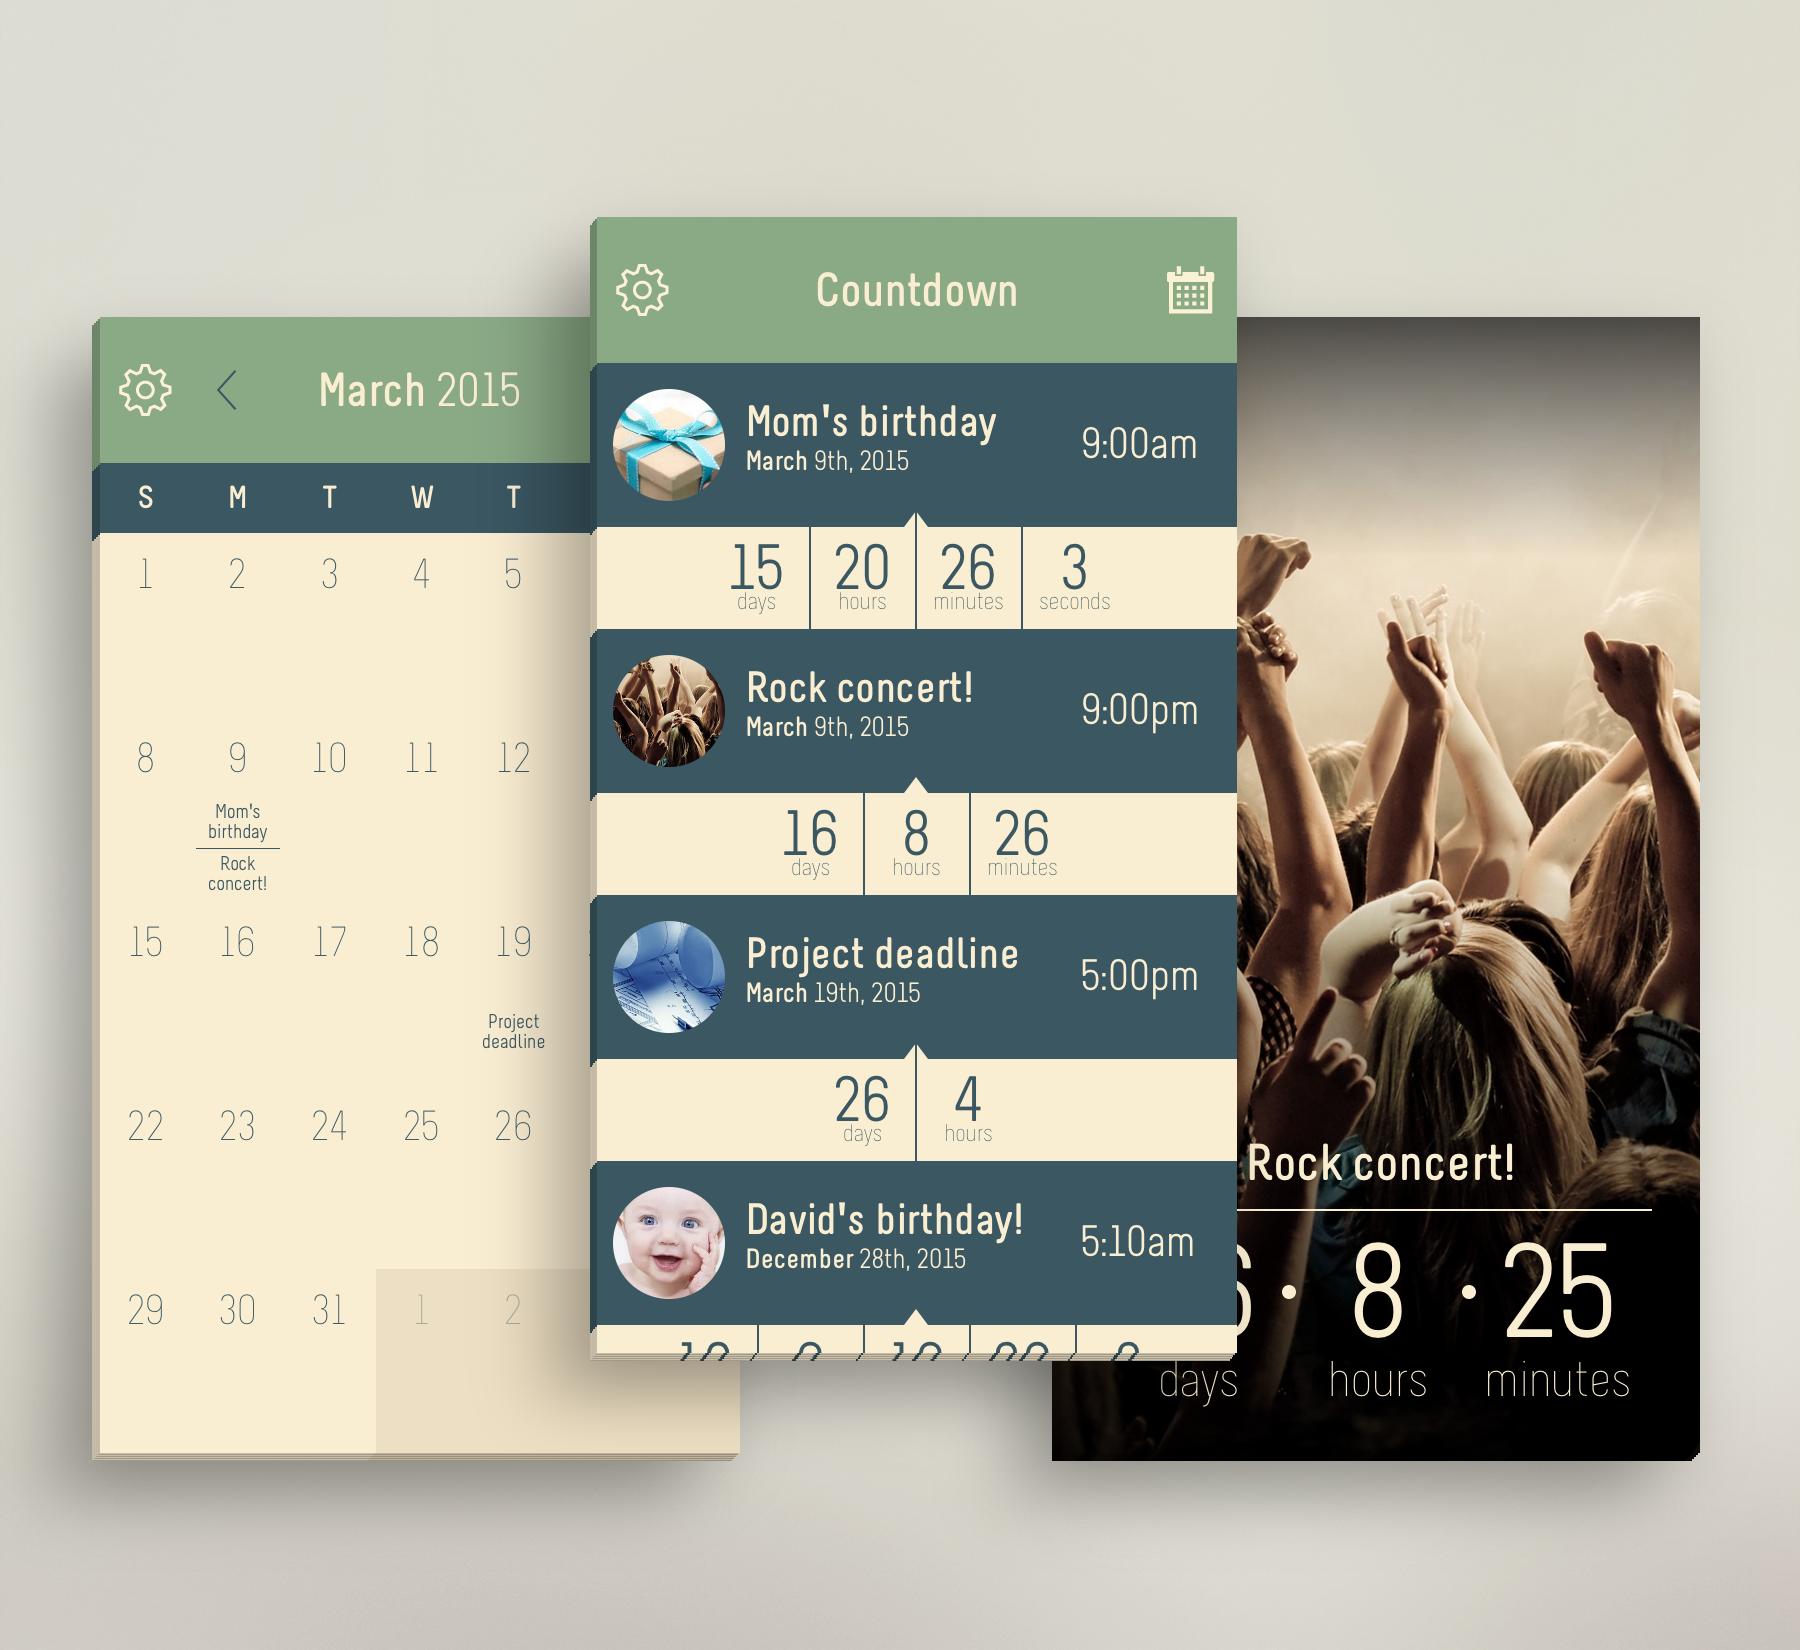 Countdown Reminder Calendar